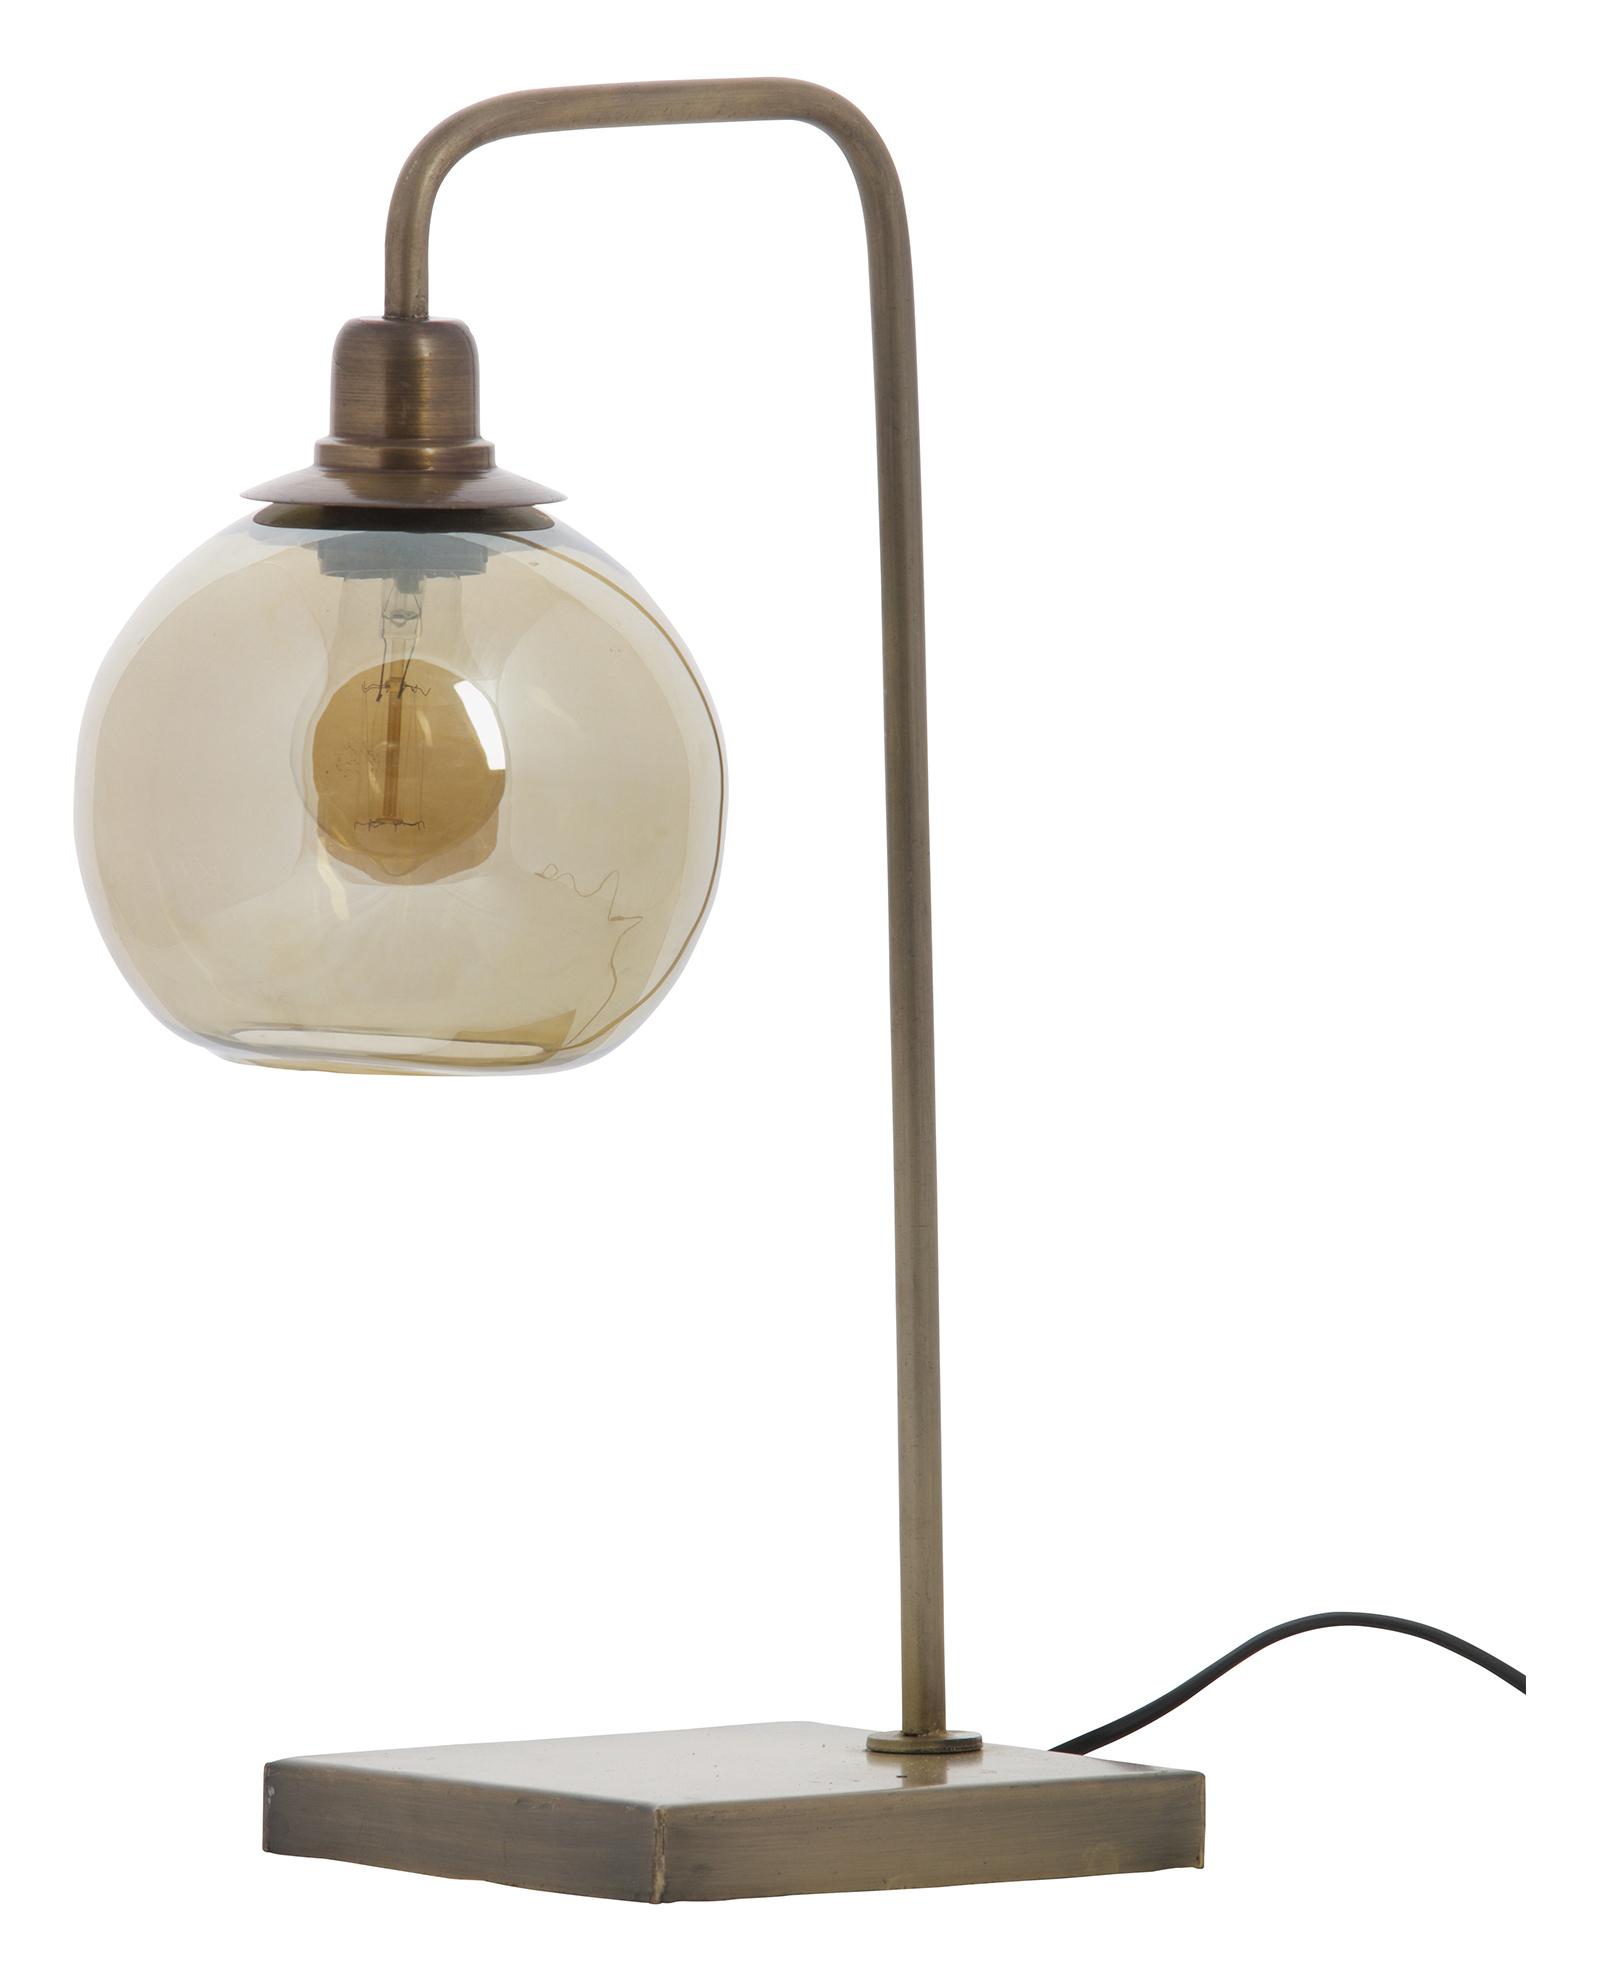 BePureHome Tafellamp 'Lantern', kleur Antique Brass Verlichting | Tafellampen kopen